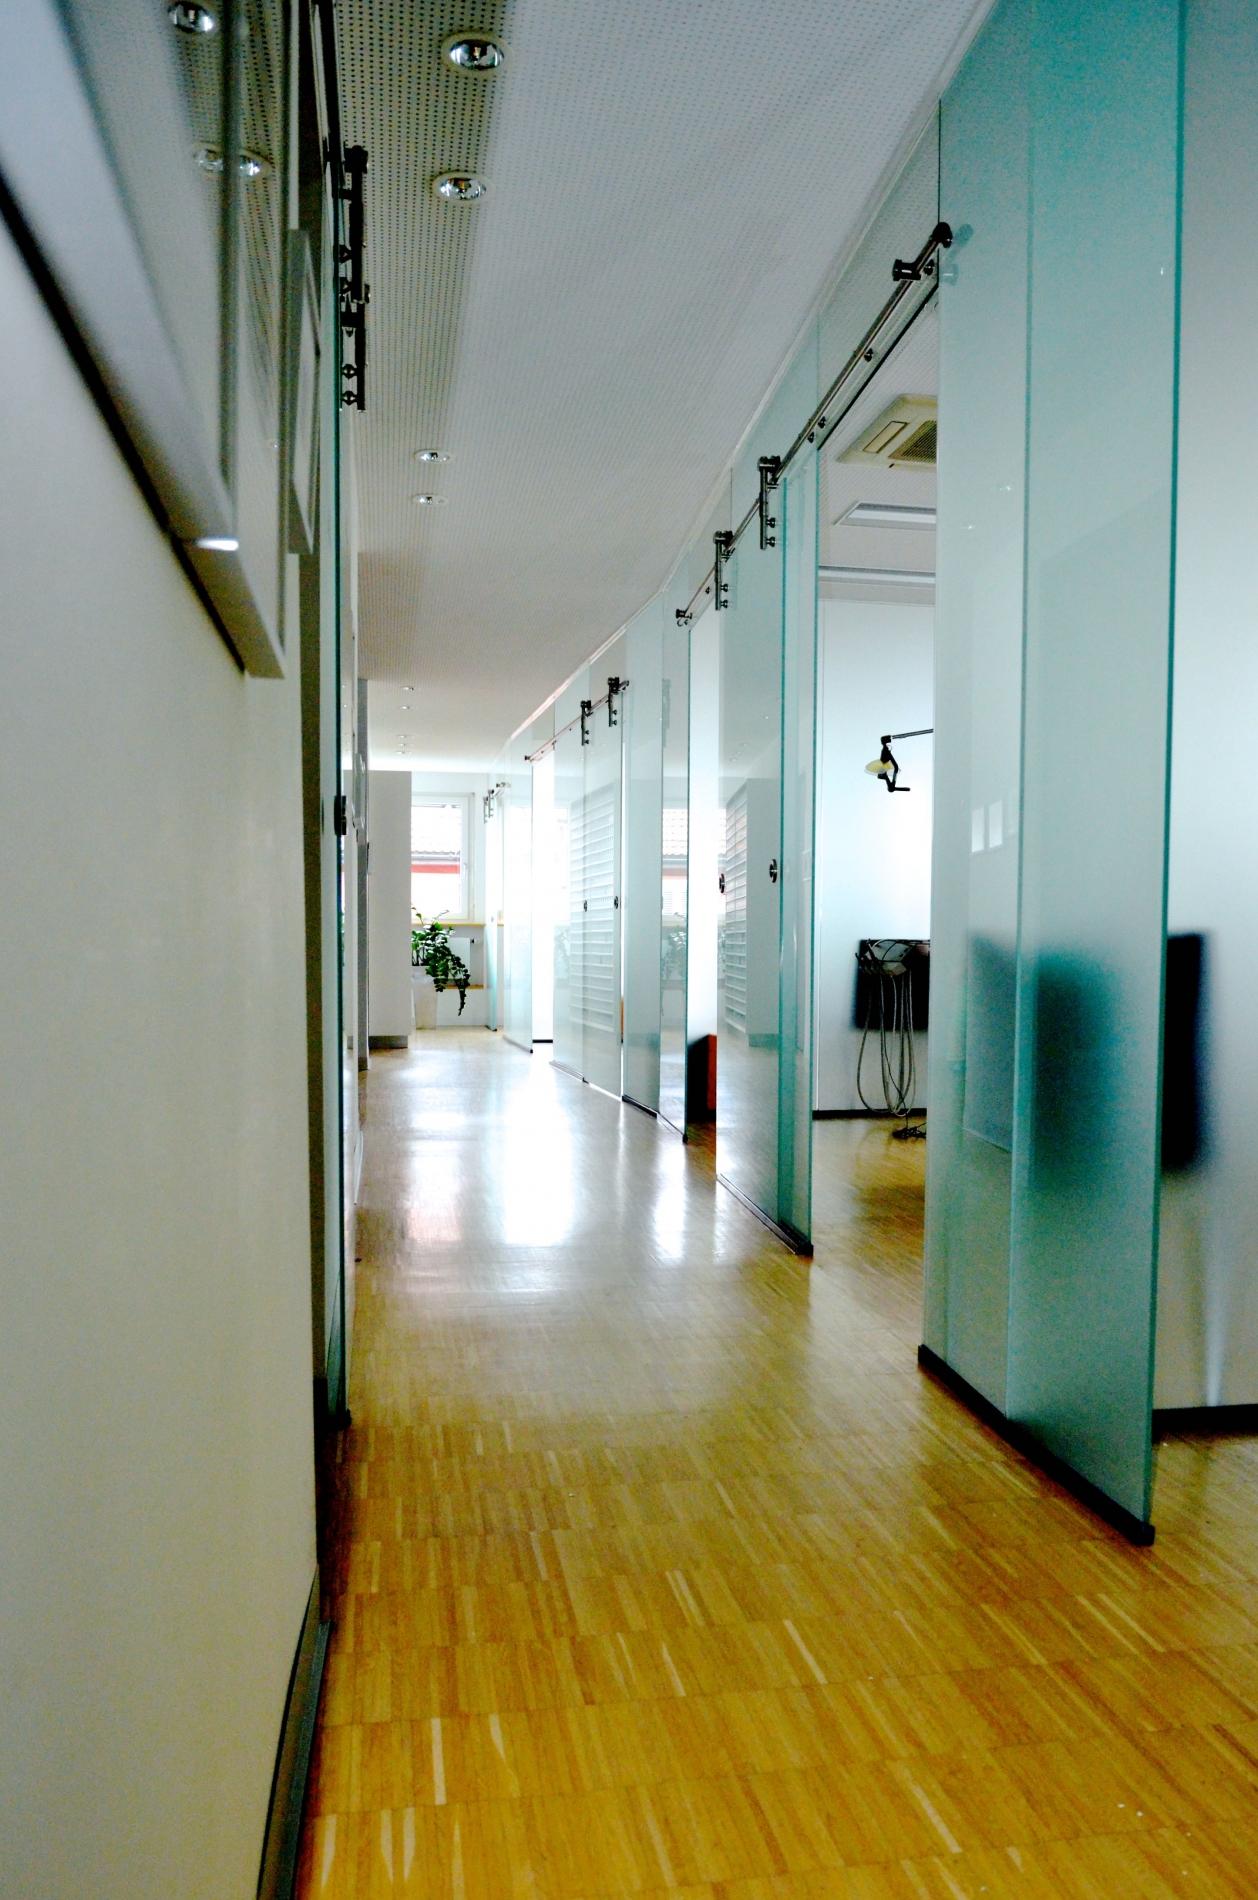 Glastürenwand